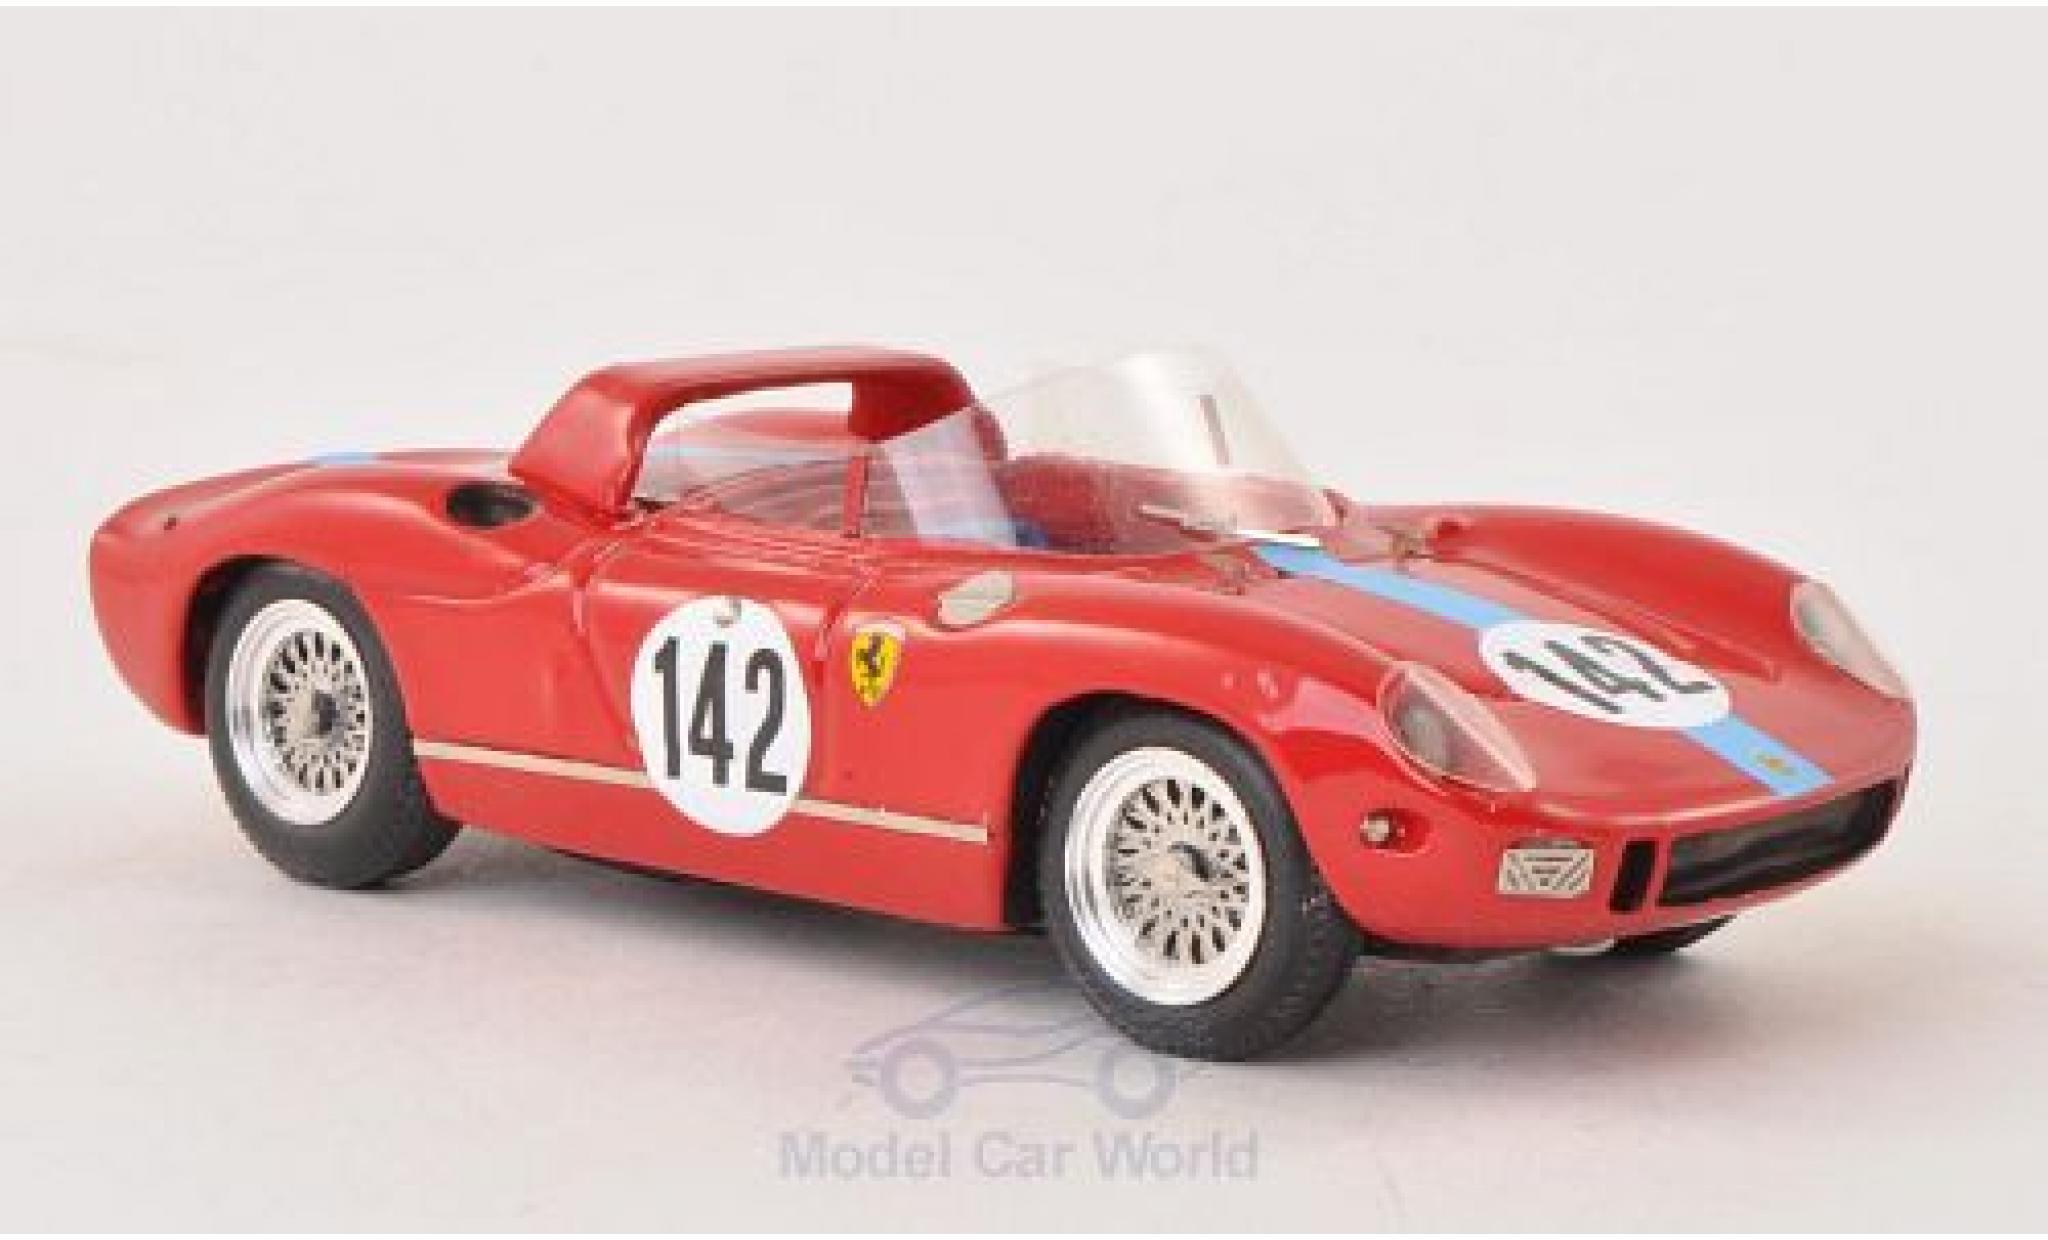 Ferrari 275 1/43 Jolly Model P No.142 Nürburgring 1964